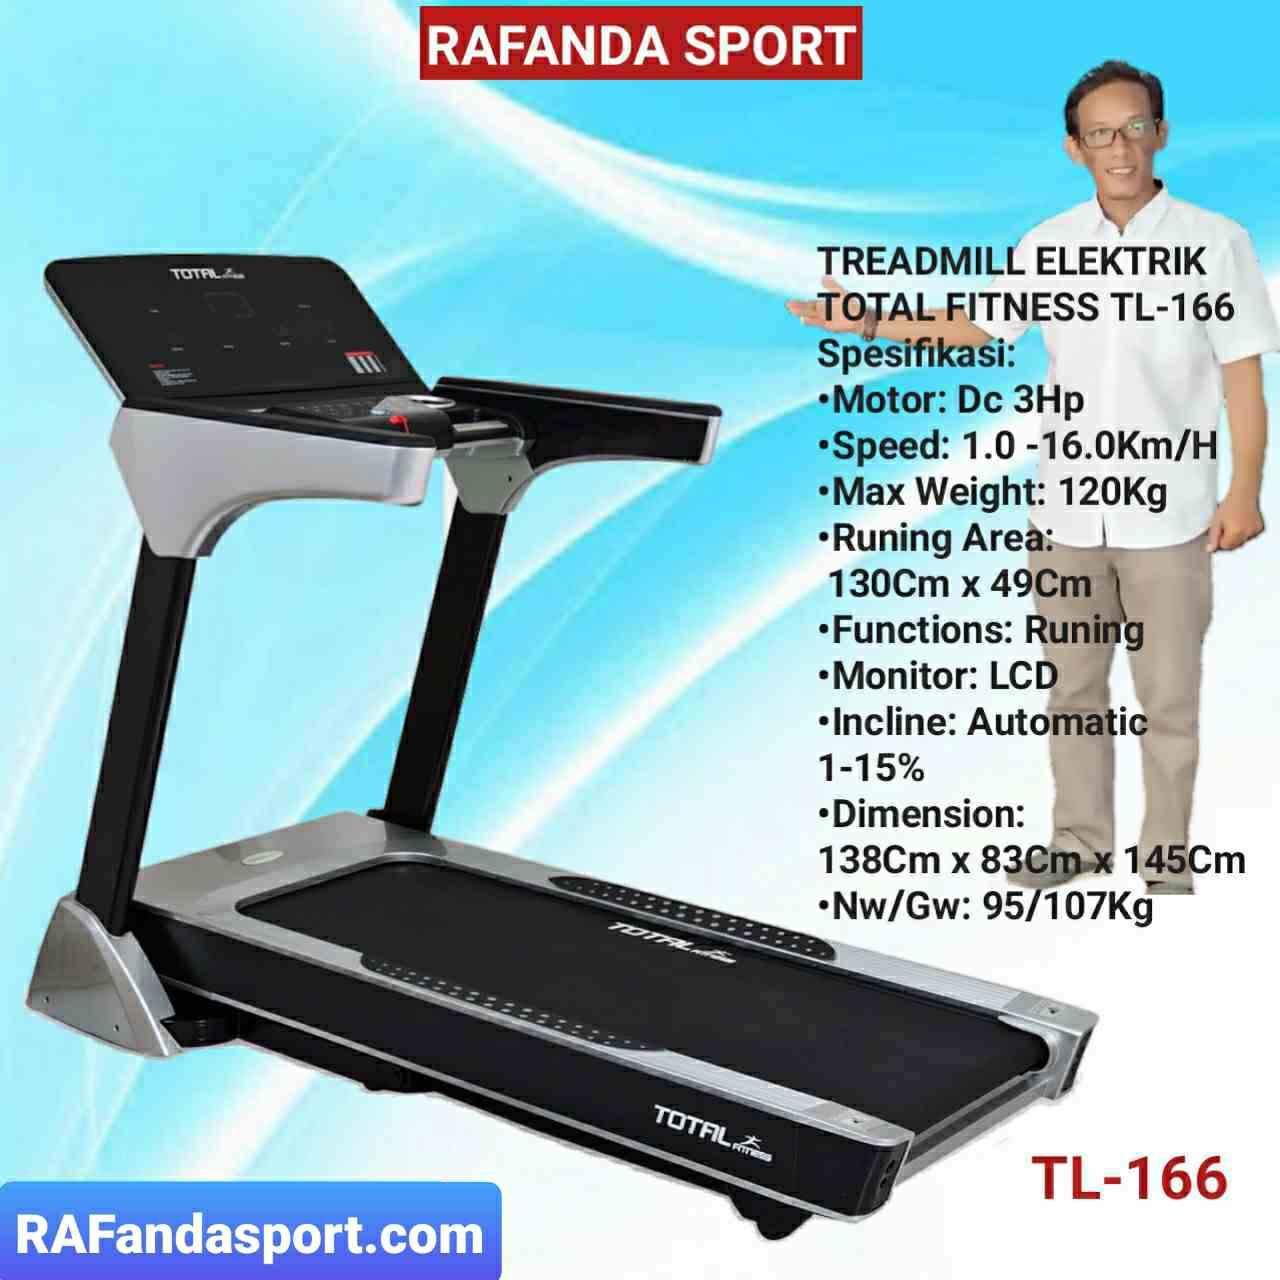 www.rafandasport.com